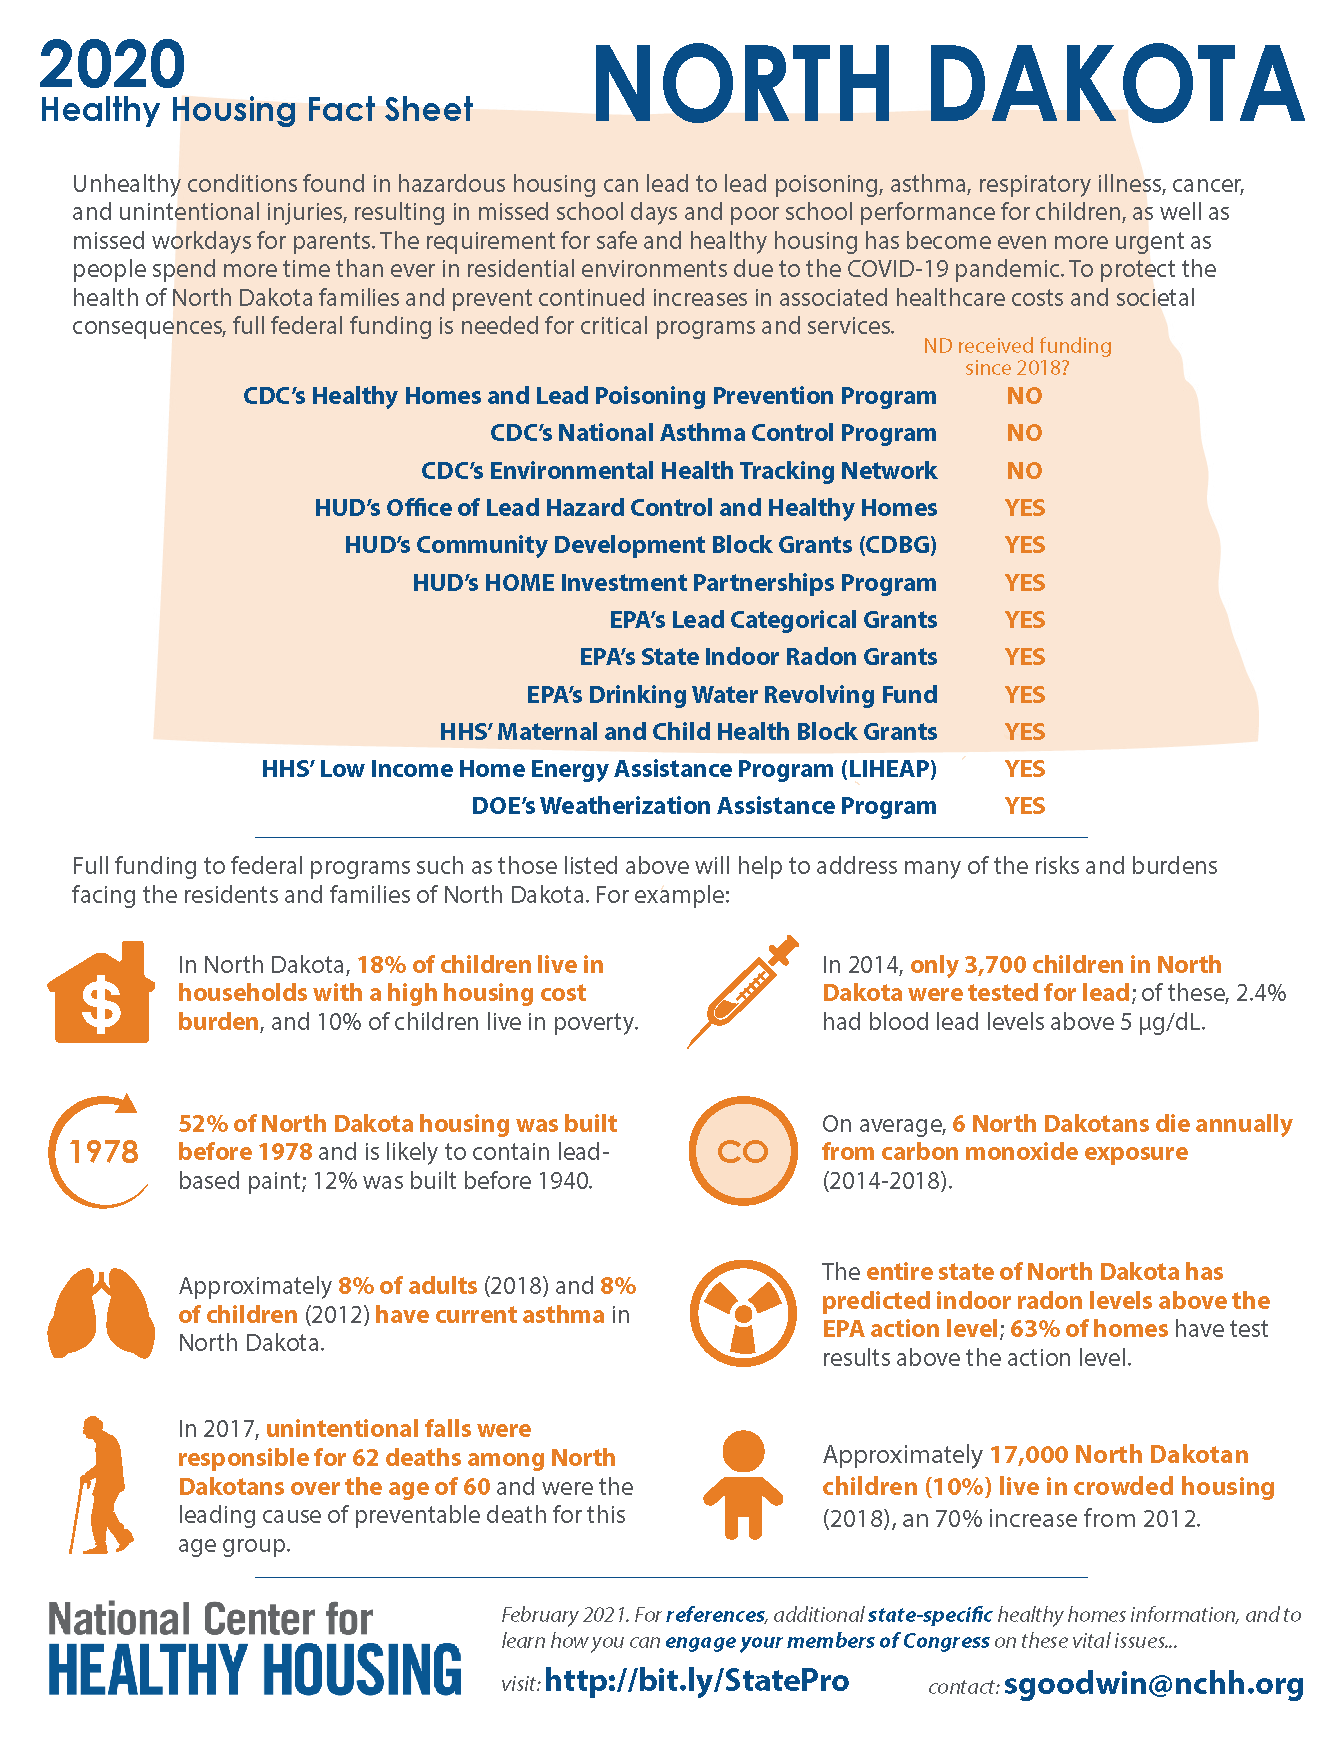 Healthy Housing Fact Sheet - North Dakota 2020